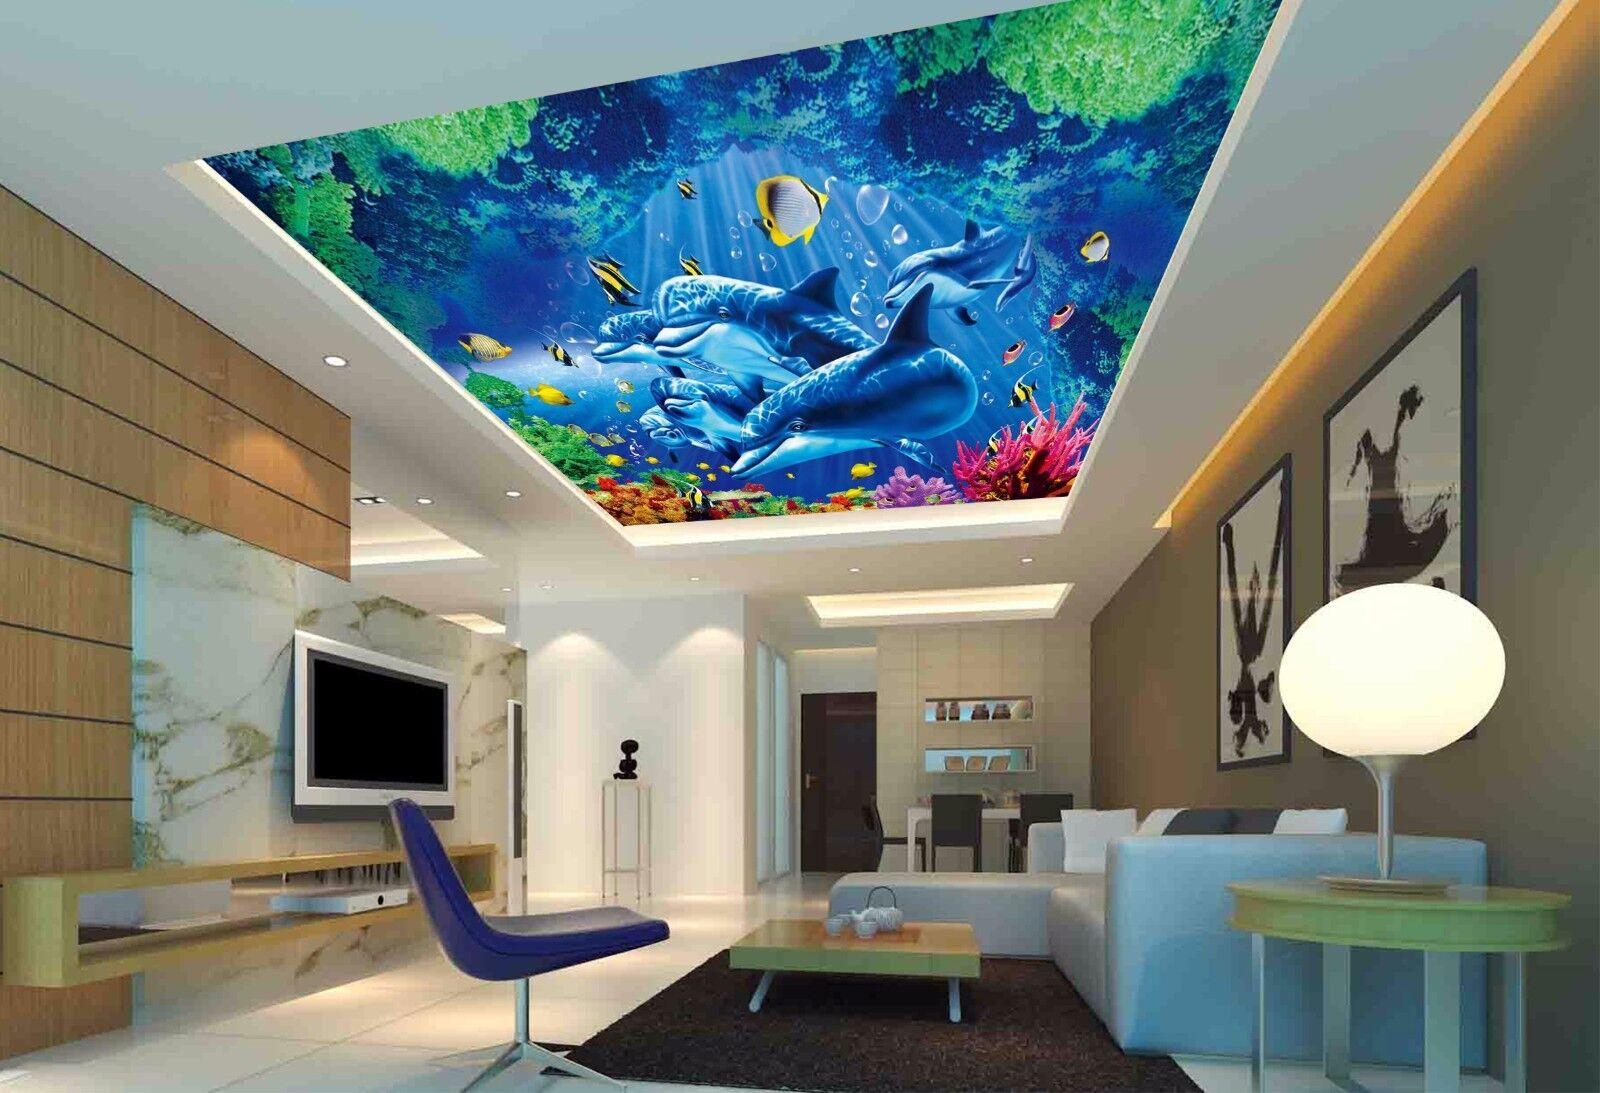 3D Dolphin Sea Ceiling WallPaper Murals Wall Print Decal Deco AJ WALLPAPER AU